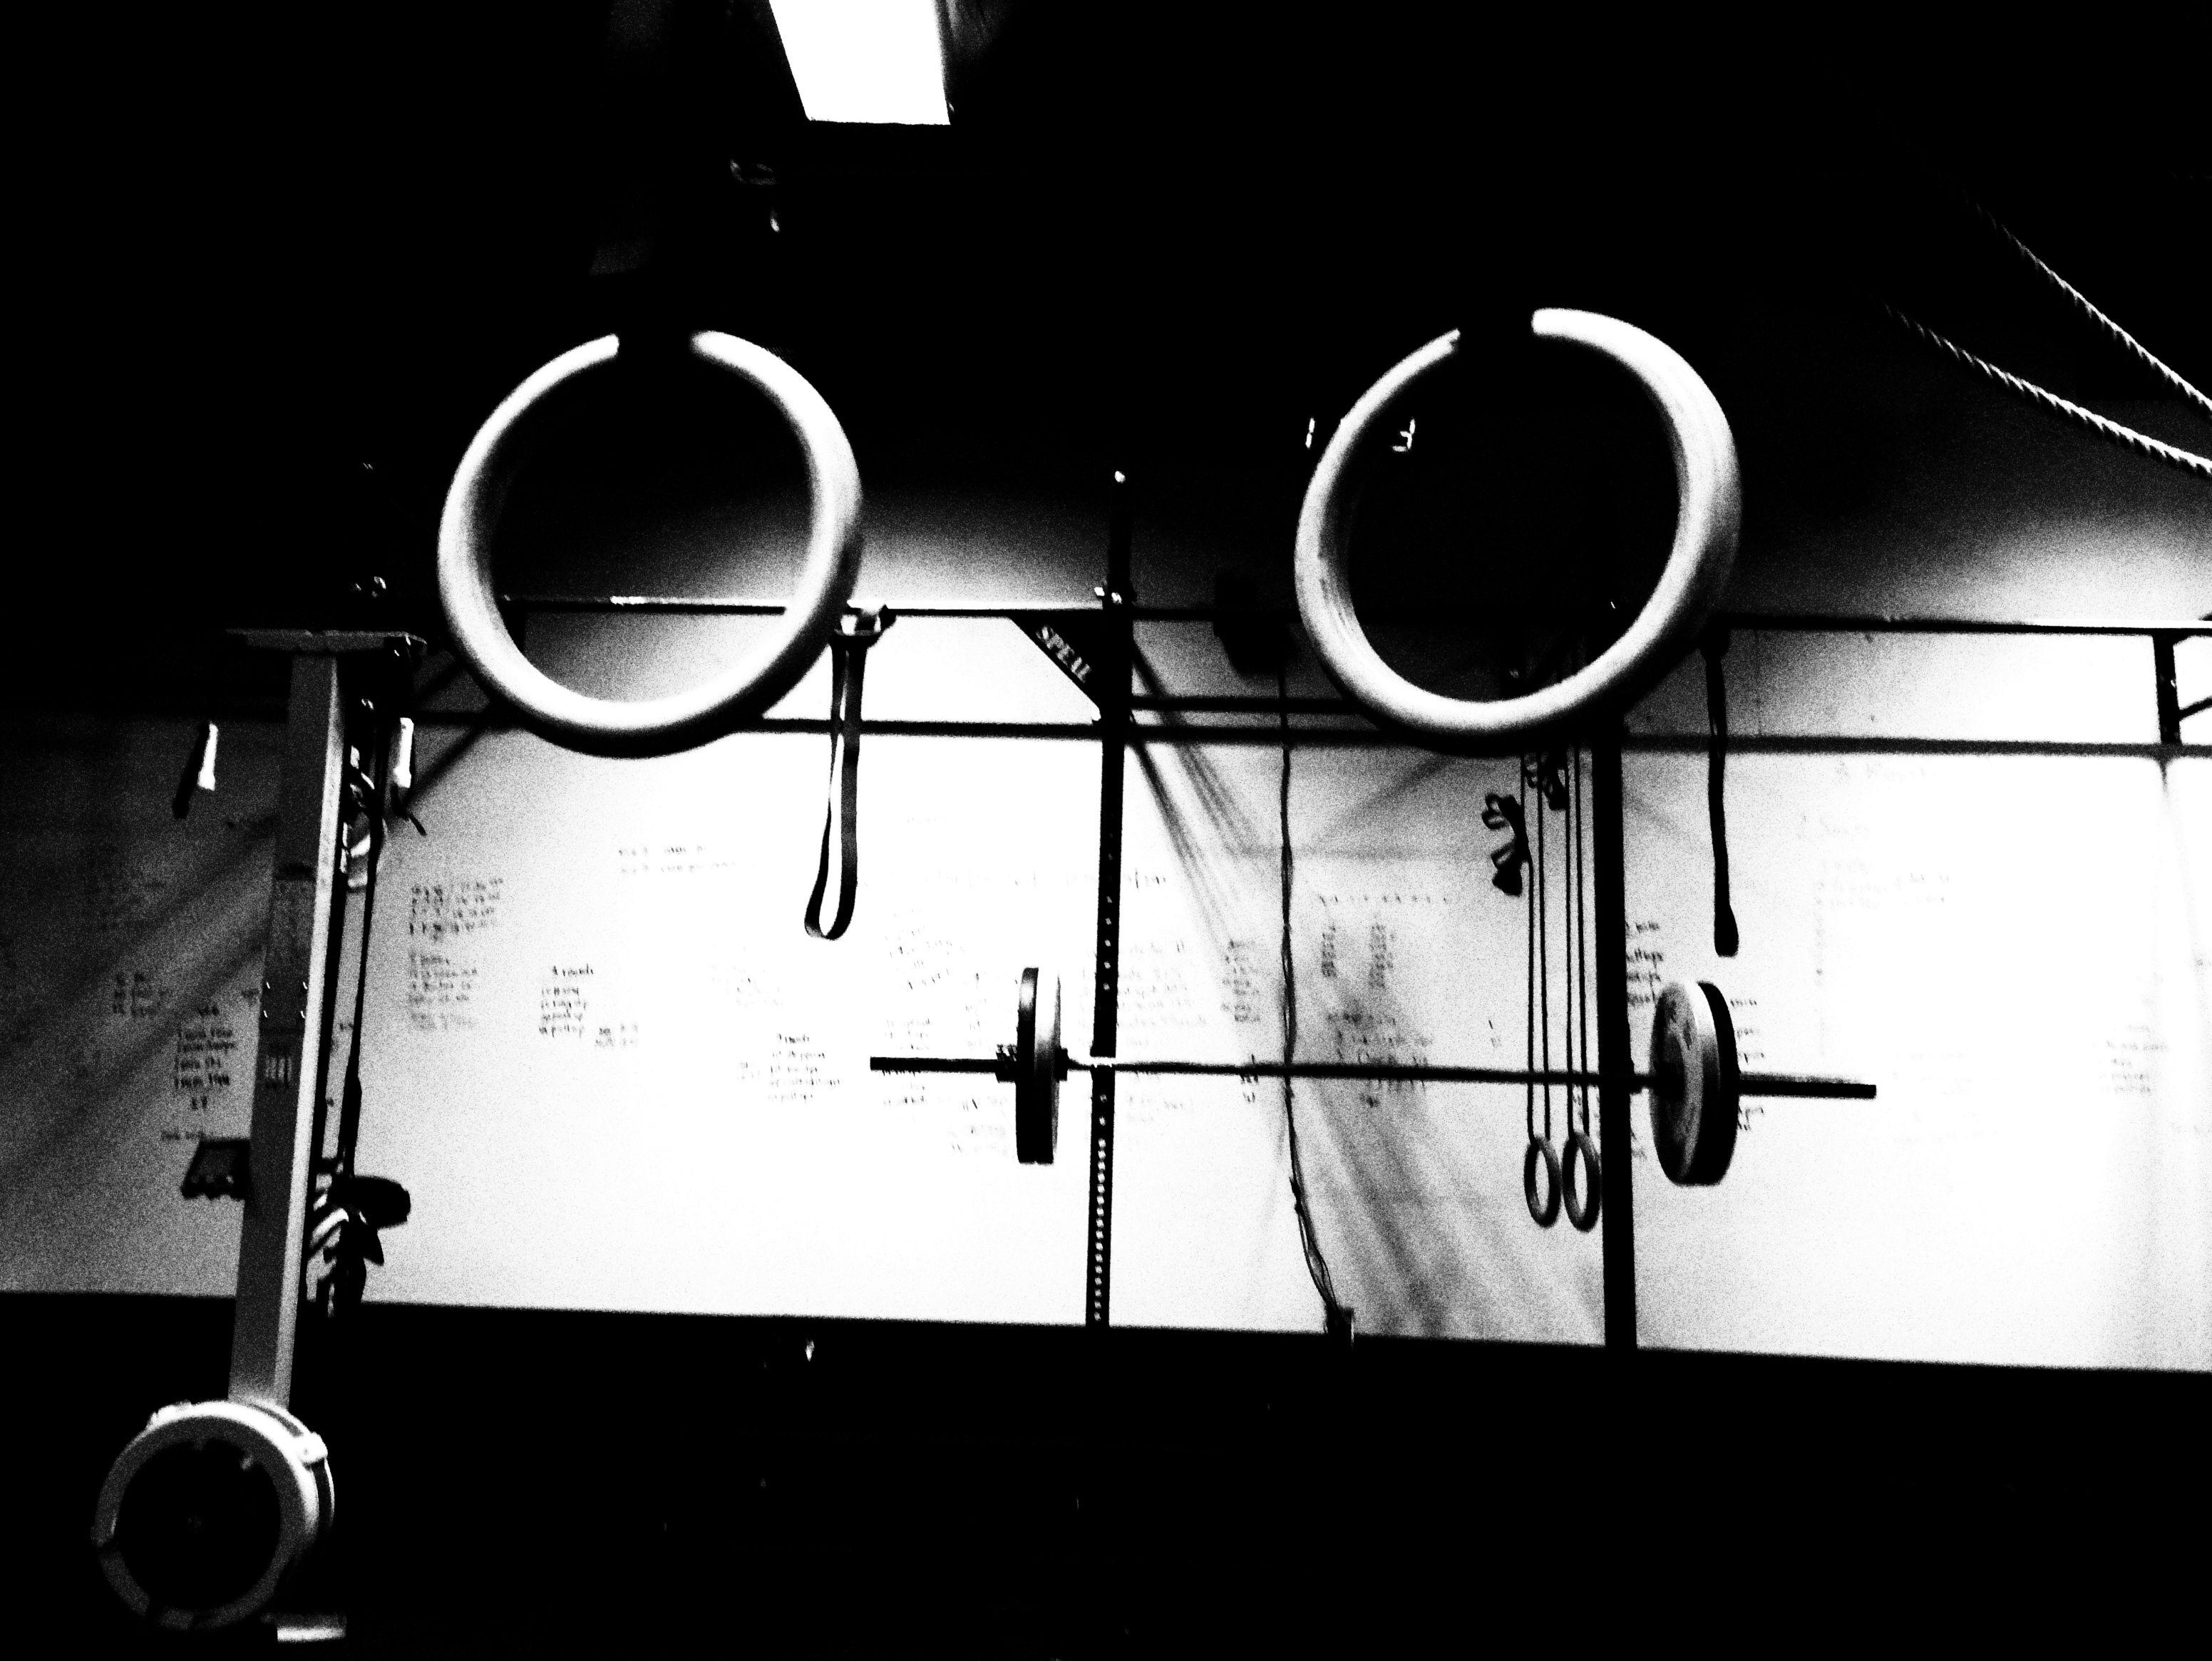 crossfit gym black and...